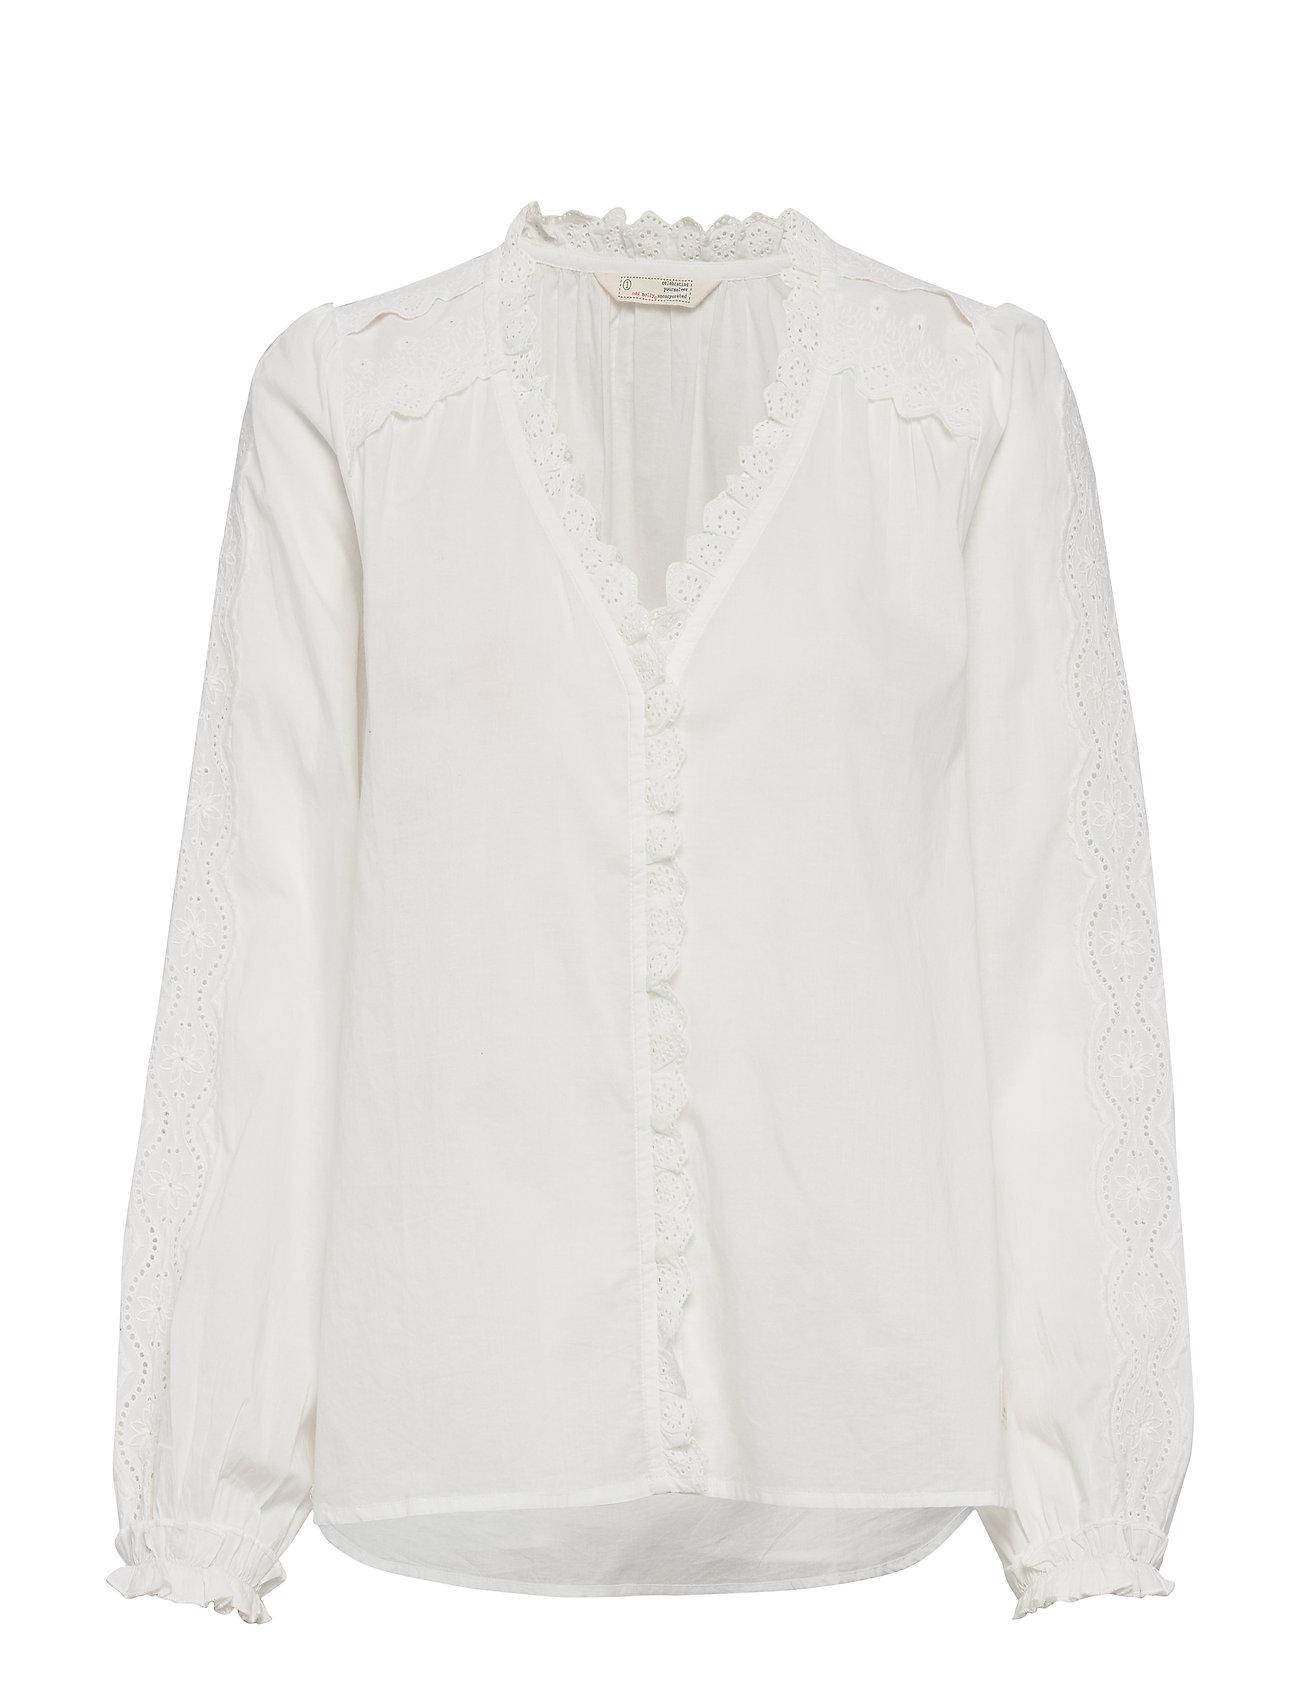 Image of Sleeves Up Blouse Bluse Langærmet Hvid ODD MOLLY (3292169129)